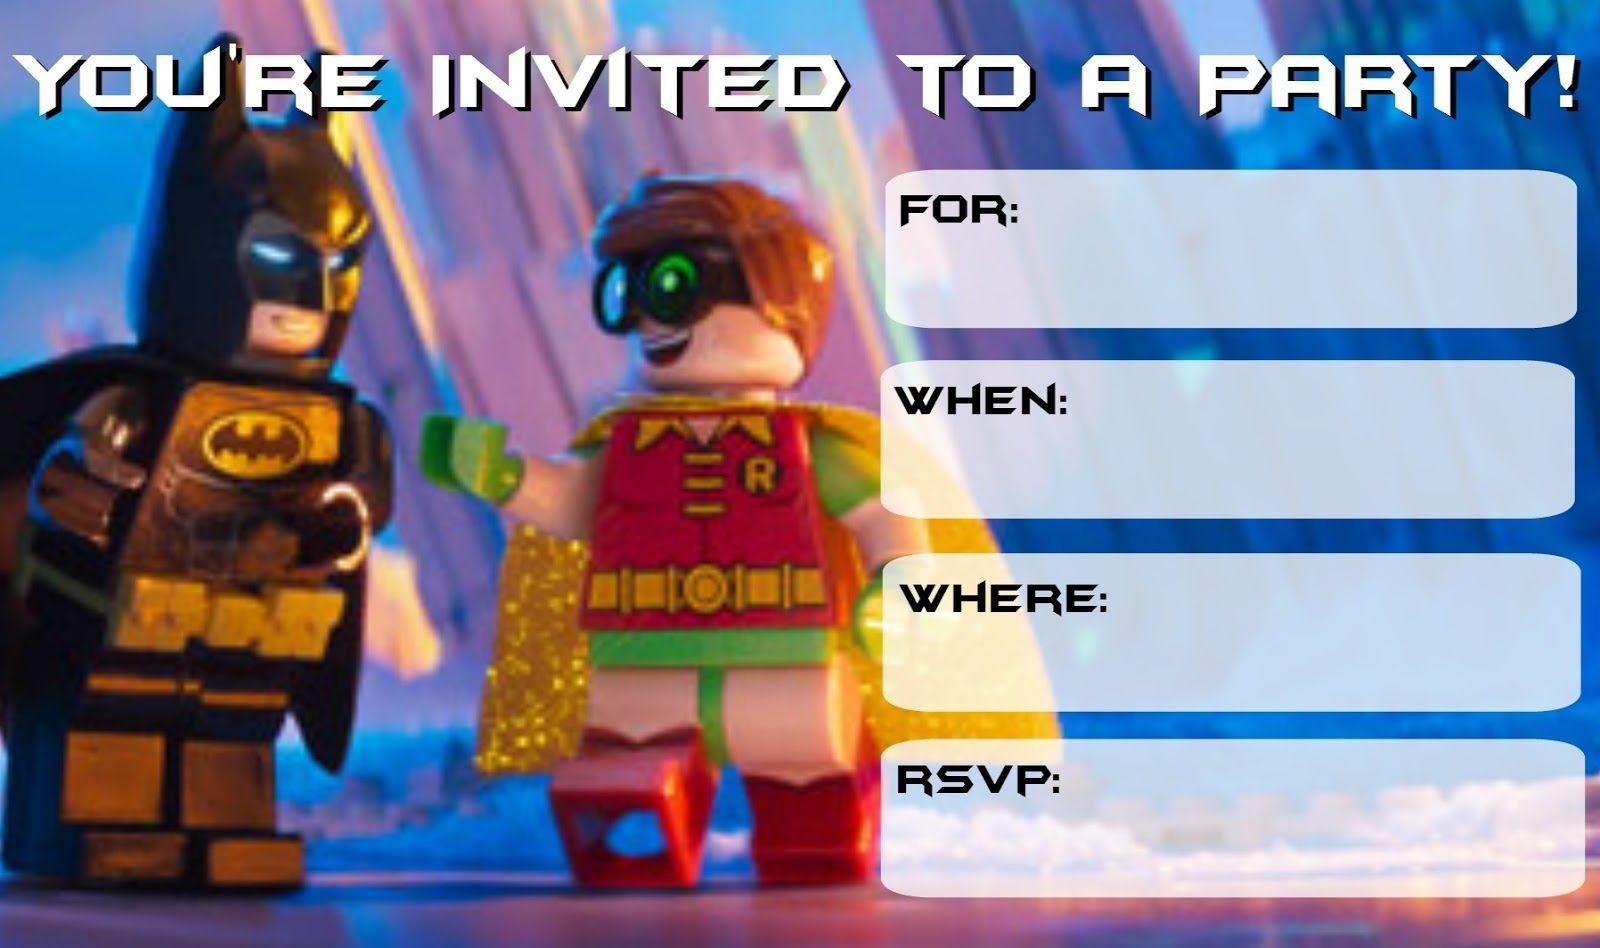 More Lego Batman Party Invitations | Drew's Birthday | Lego Batman - Lego Batman Party Invitations Free Printable